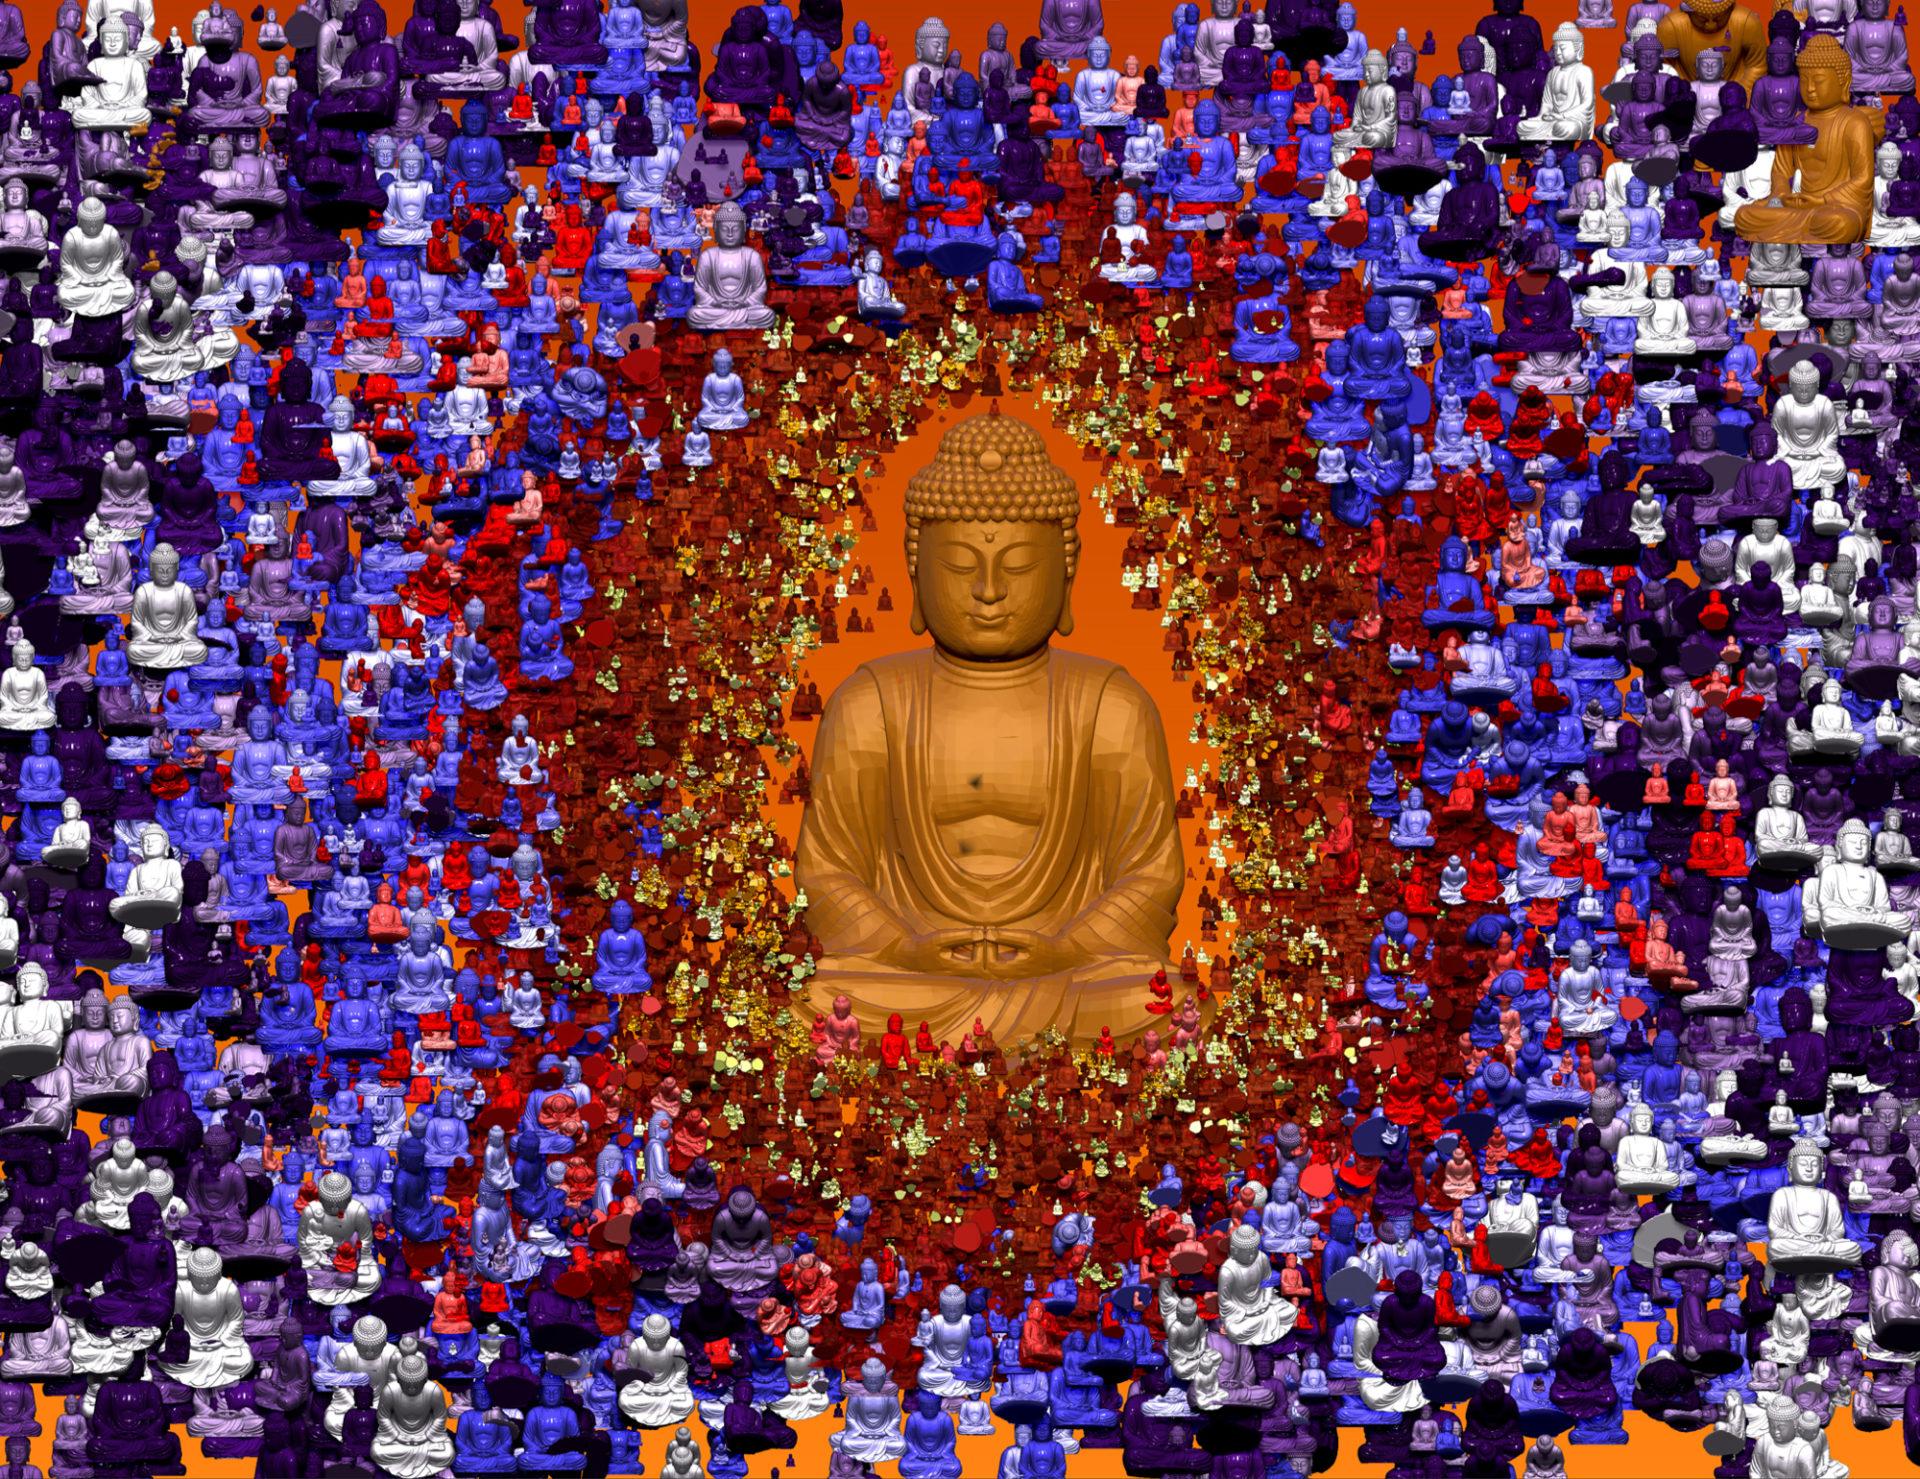 Buddah Texture - Extreme Meditation